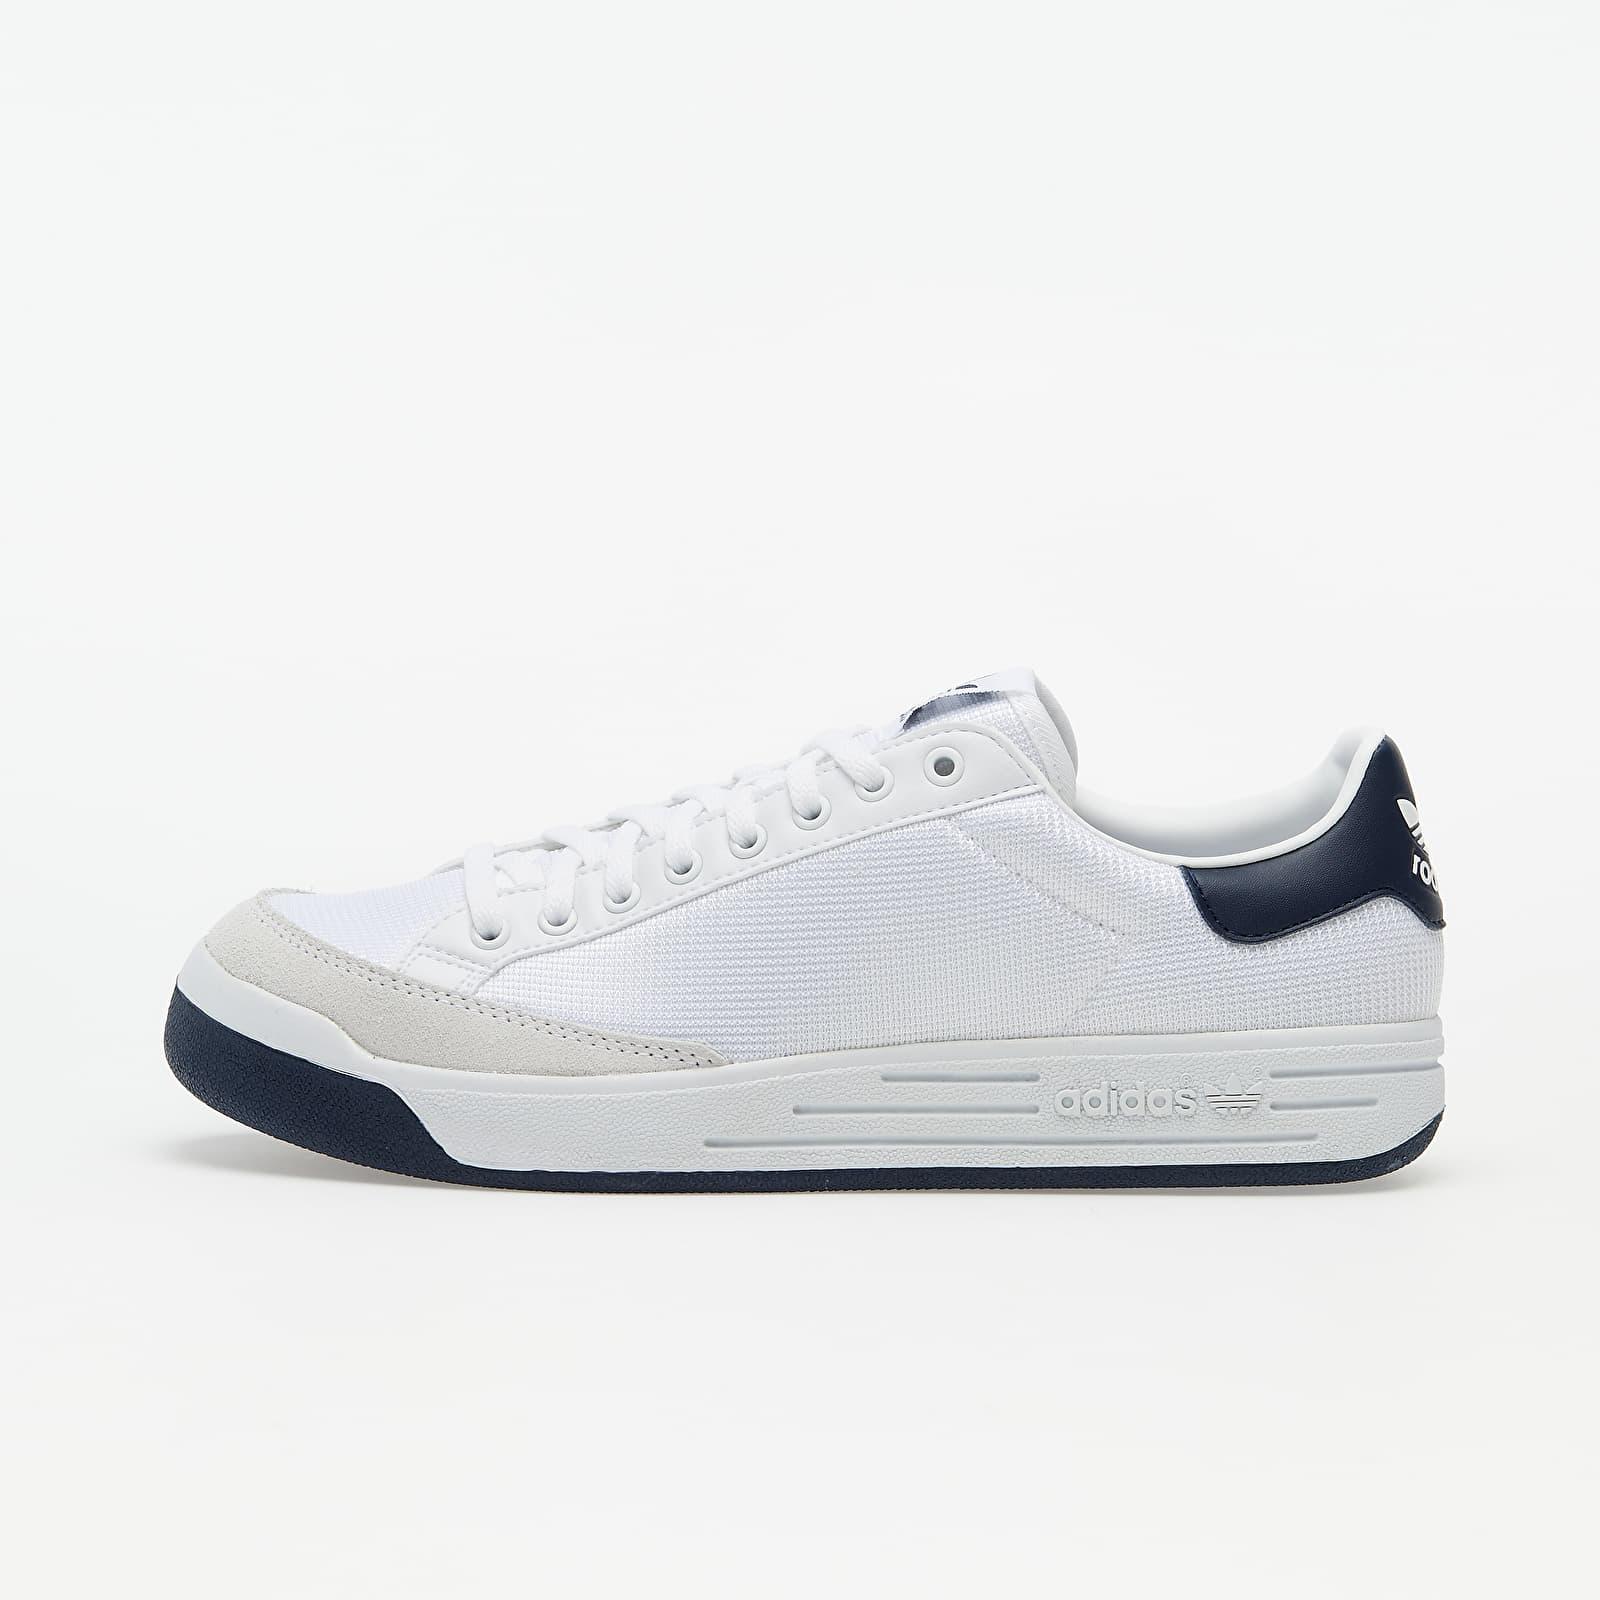 adidas Rod Laver Run White/ Run White/ Collegiate Navy G99864